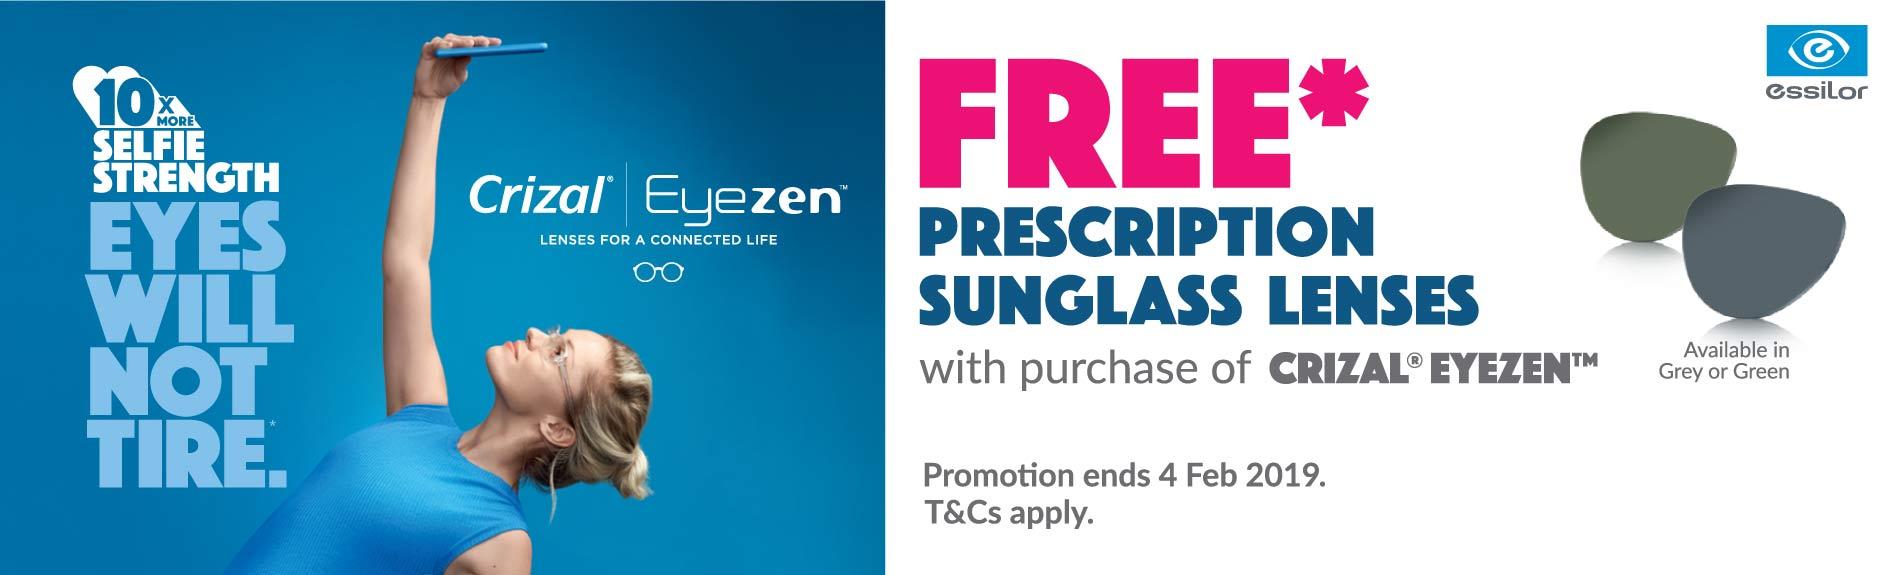 8a95629fcbd Crizal eyezen fixed tint promotion essilor singapore jpg 1903x575 Who sells crizal  lenses